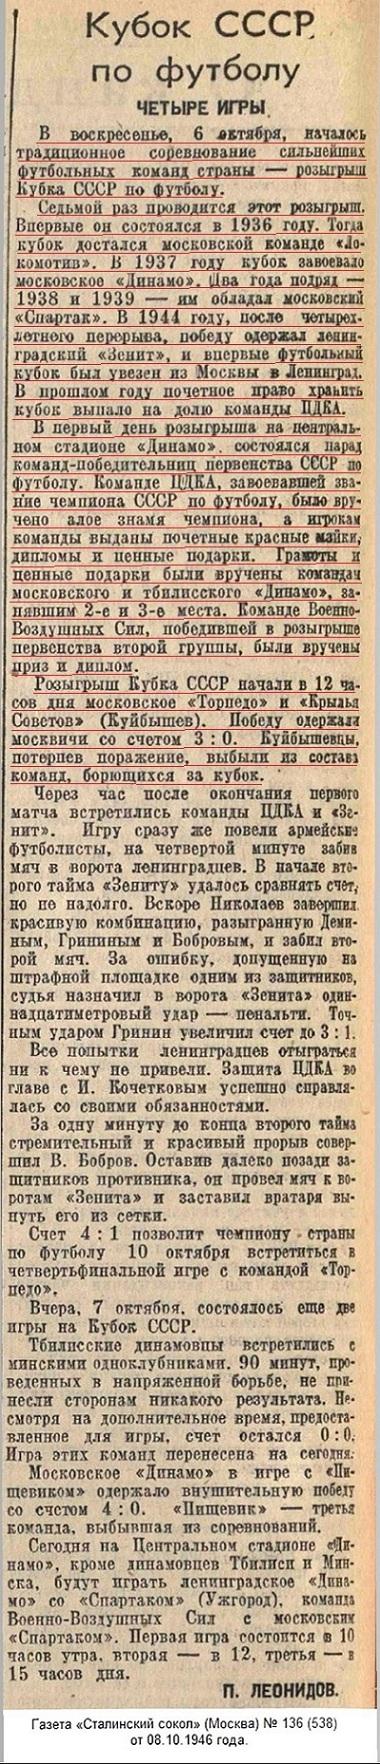 Торпедо (Москва) - Крылья Советов (Куйбышев) 3:0